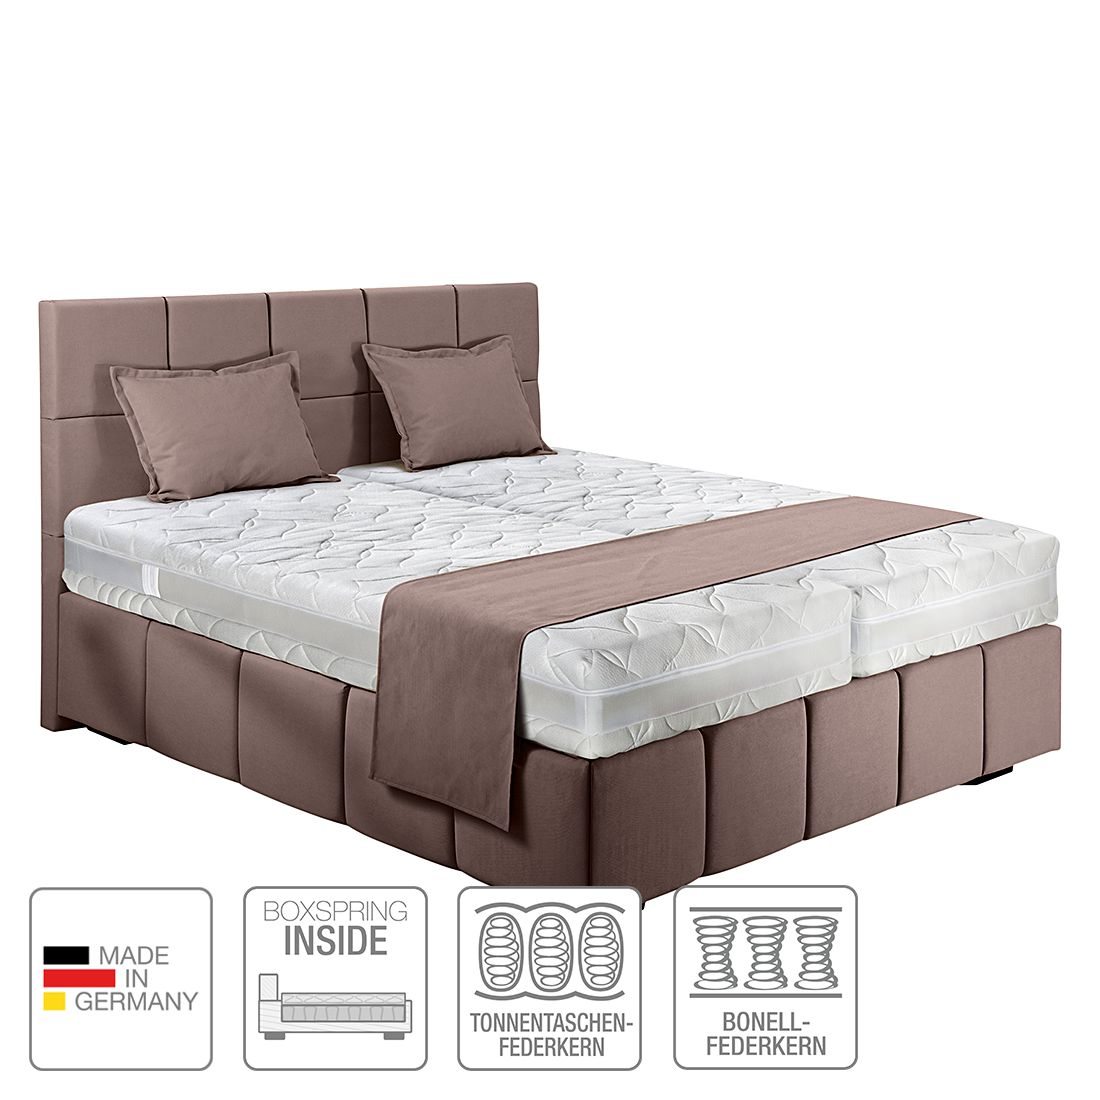 Boxspring-Inside-Bett Olena – Webstoff – 180 x 200cm – H4 ab 100 kg – Schlamm, Nova Dream Sleepline jetzt kaufen